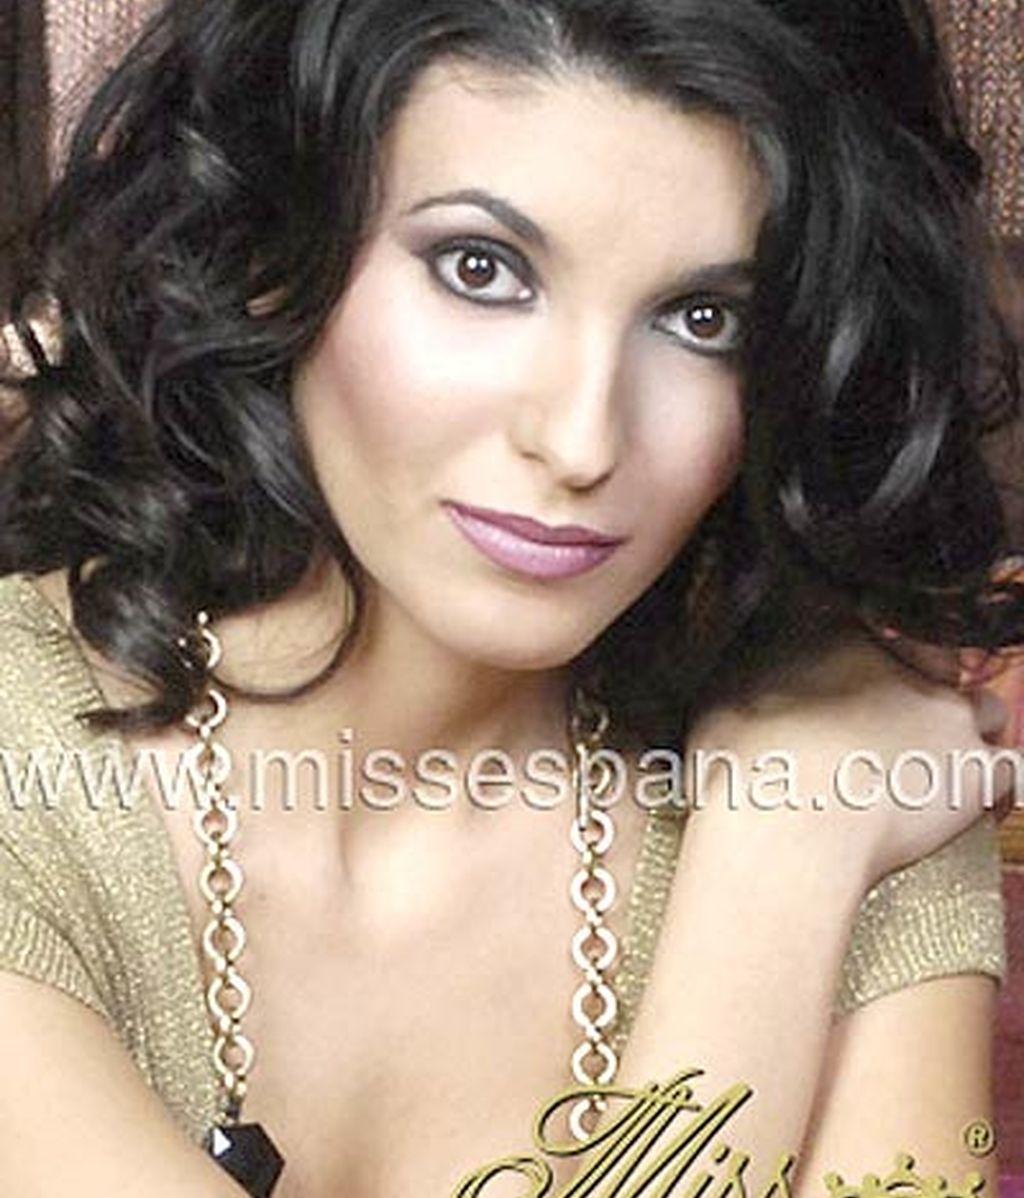 Miss Fea 2008